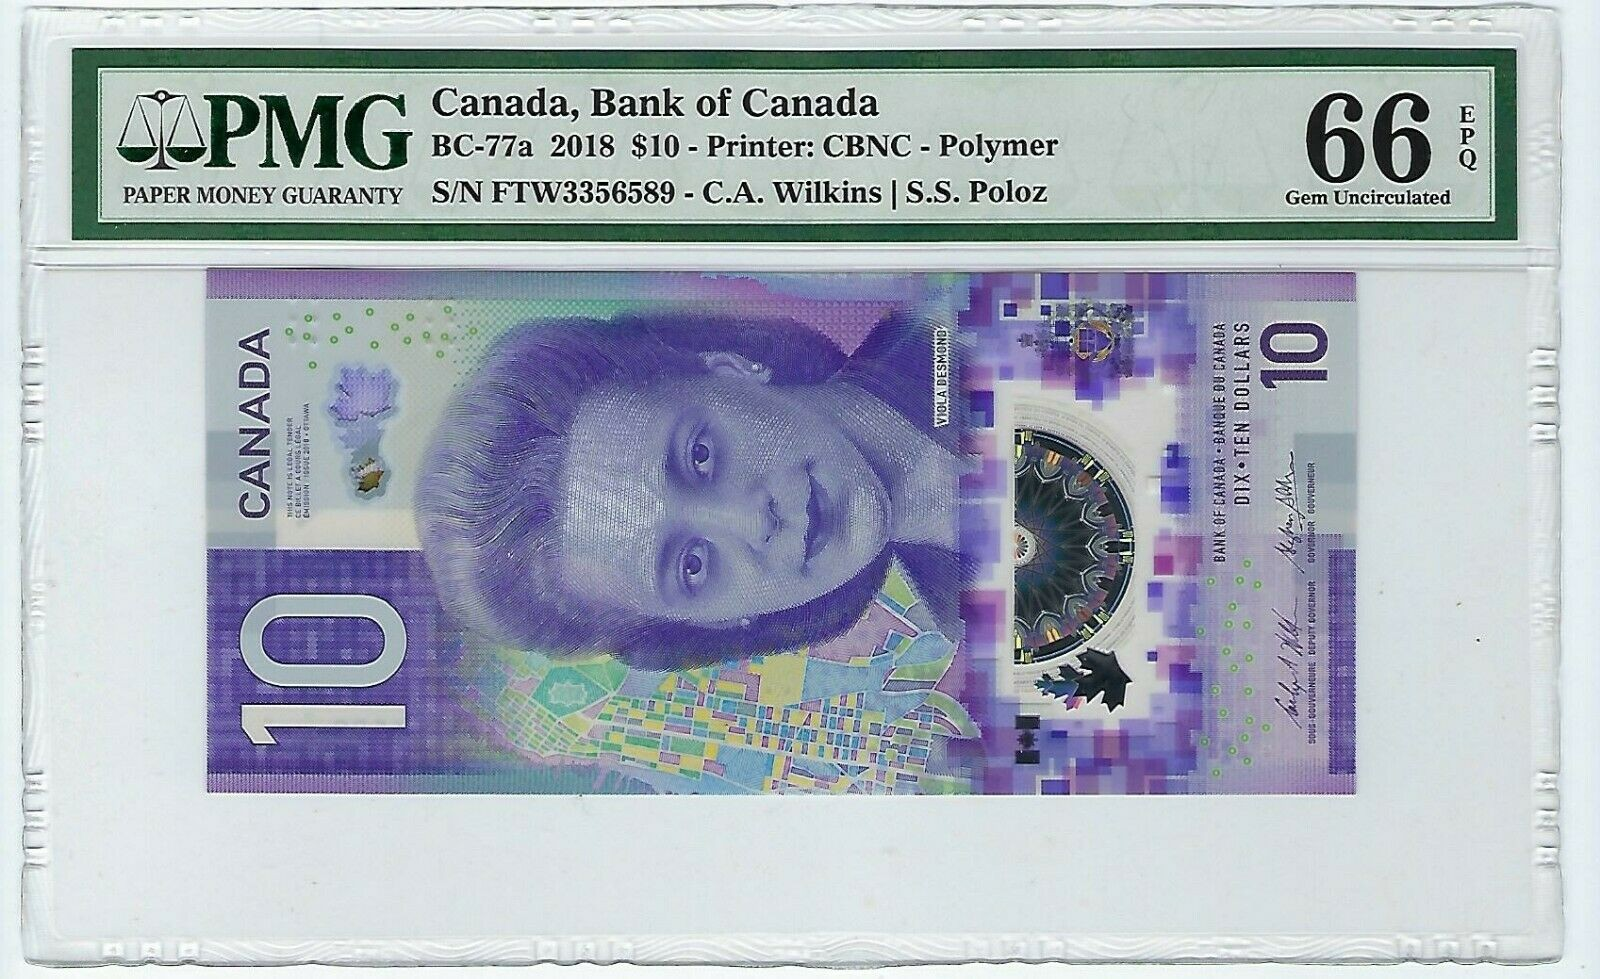 CANADA 10 DOLLARS ND 2018 P NEW POLYMER GEM UNC PMG 66 EPQ obv.jpg